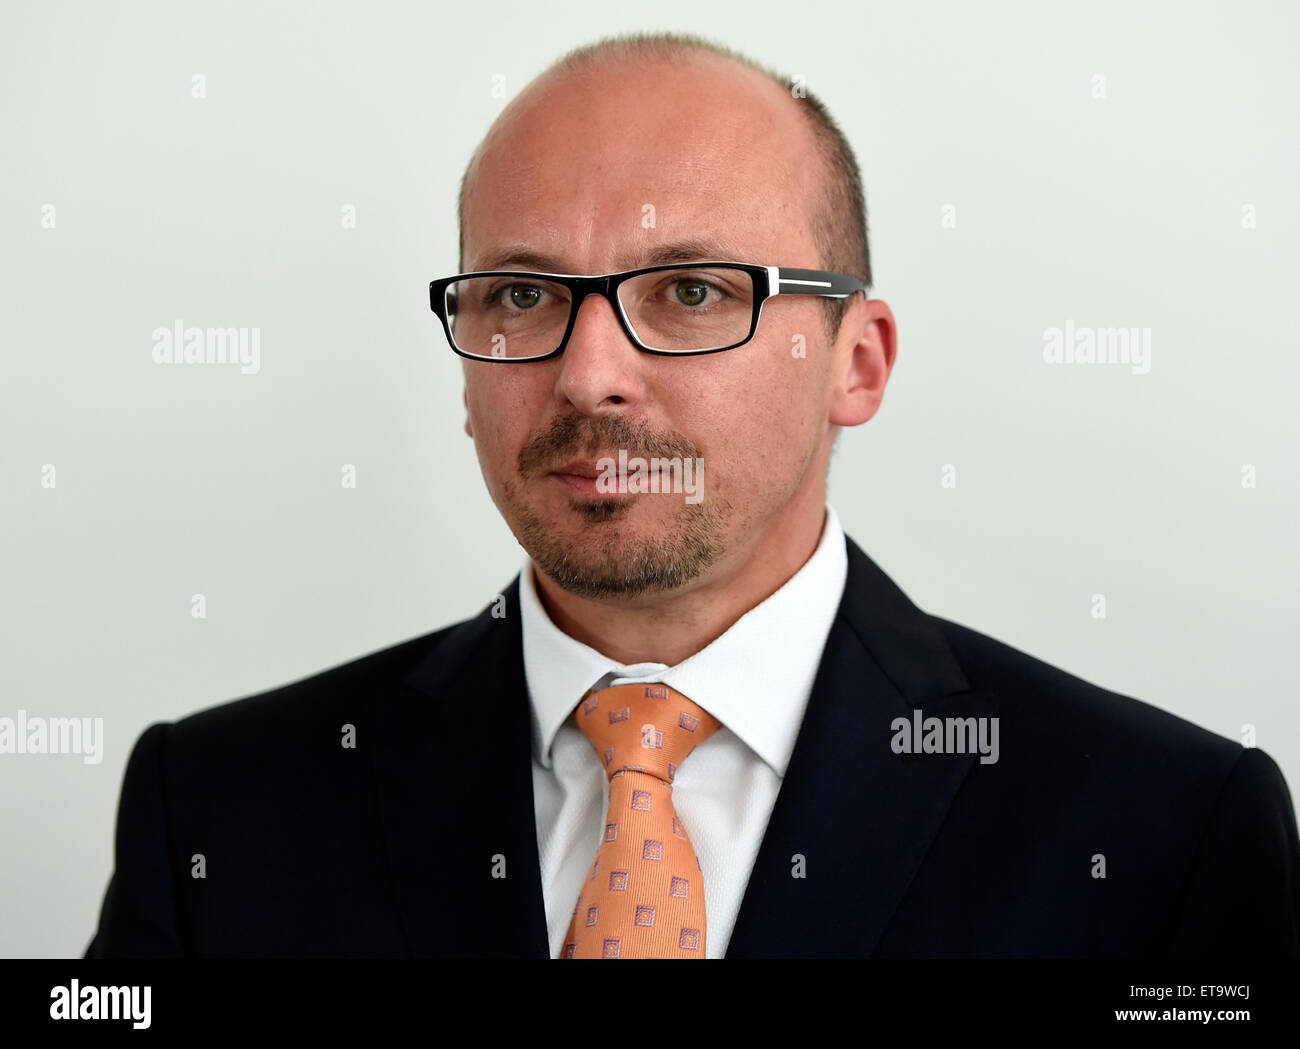 Frantisek Lukl, mayor of Kyjov and regional development minister in the former caretaker government of Jiri Rusnok, - Stock Image